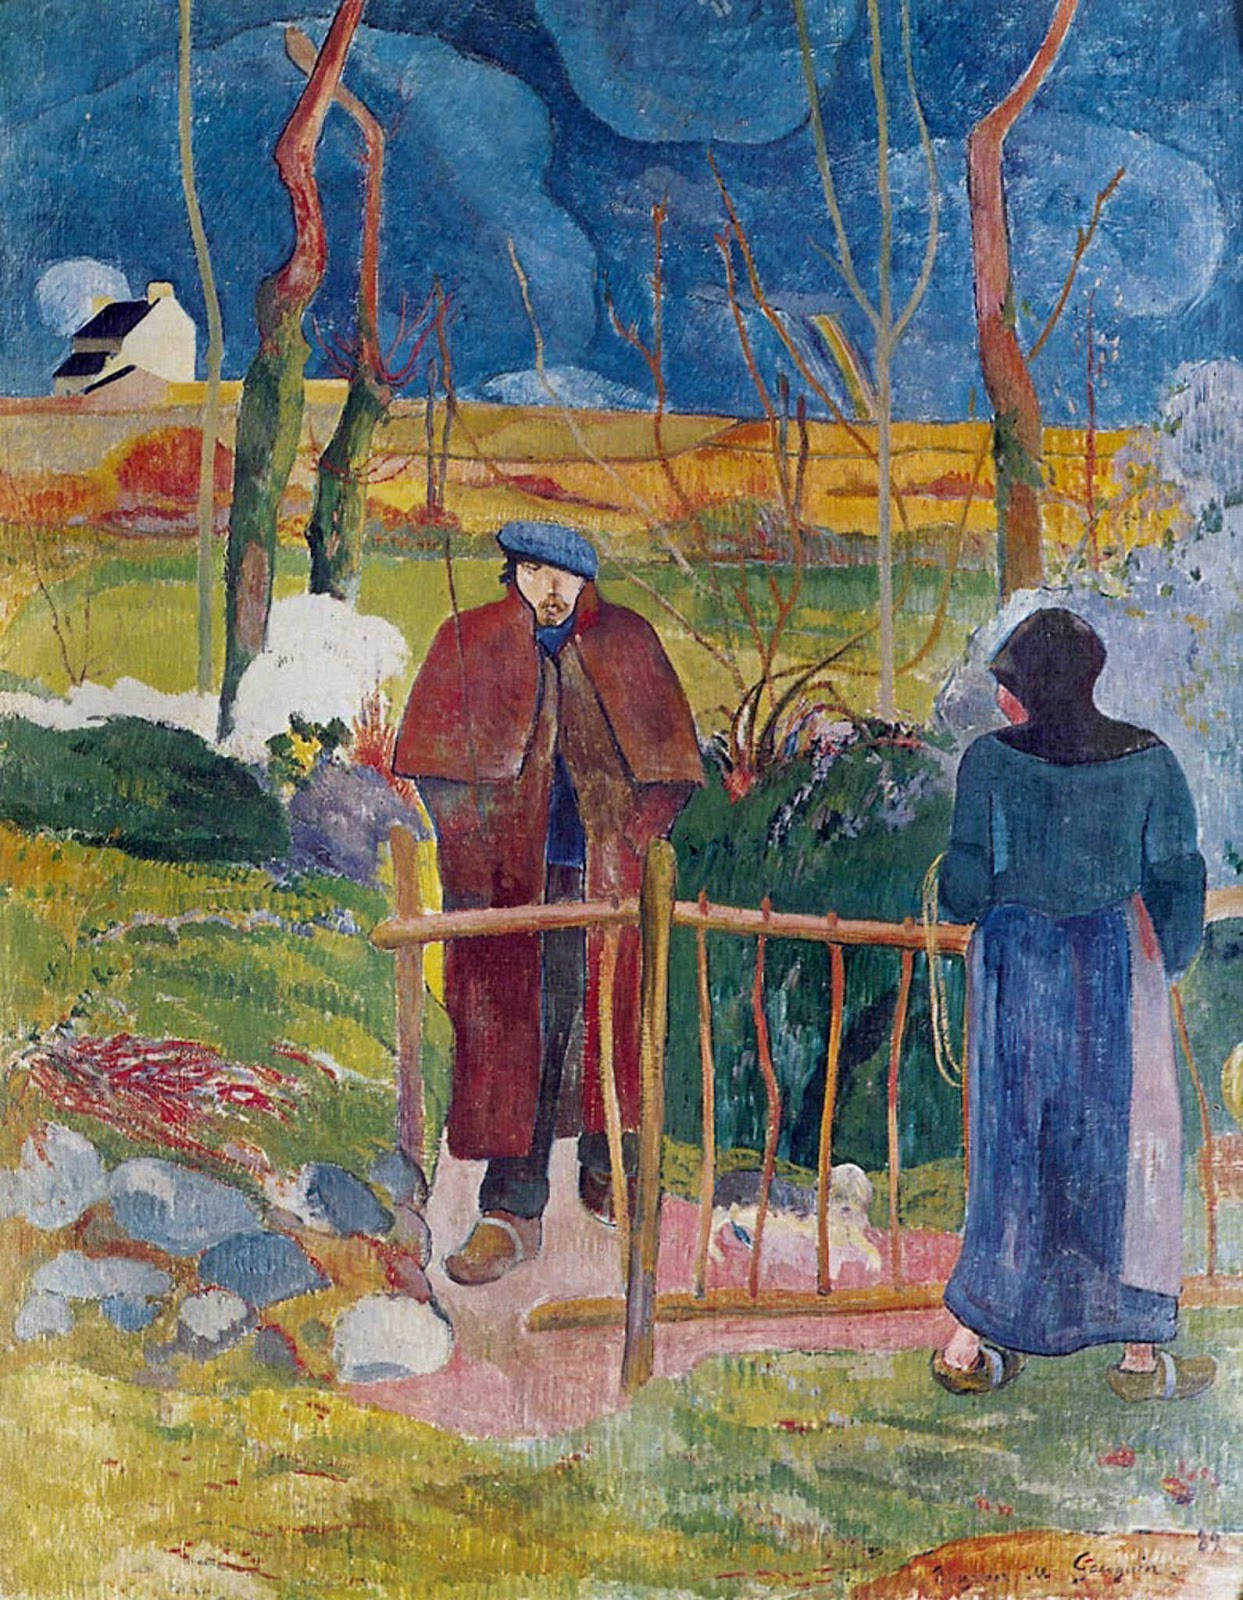 buonjour ms gauguin